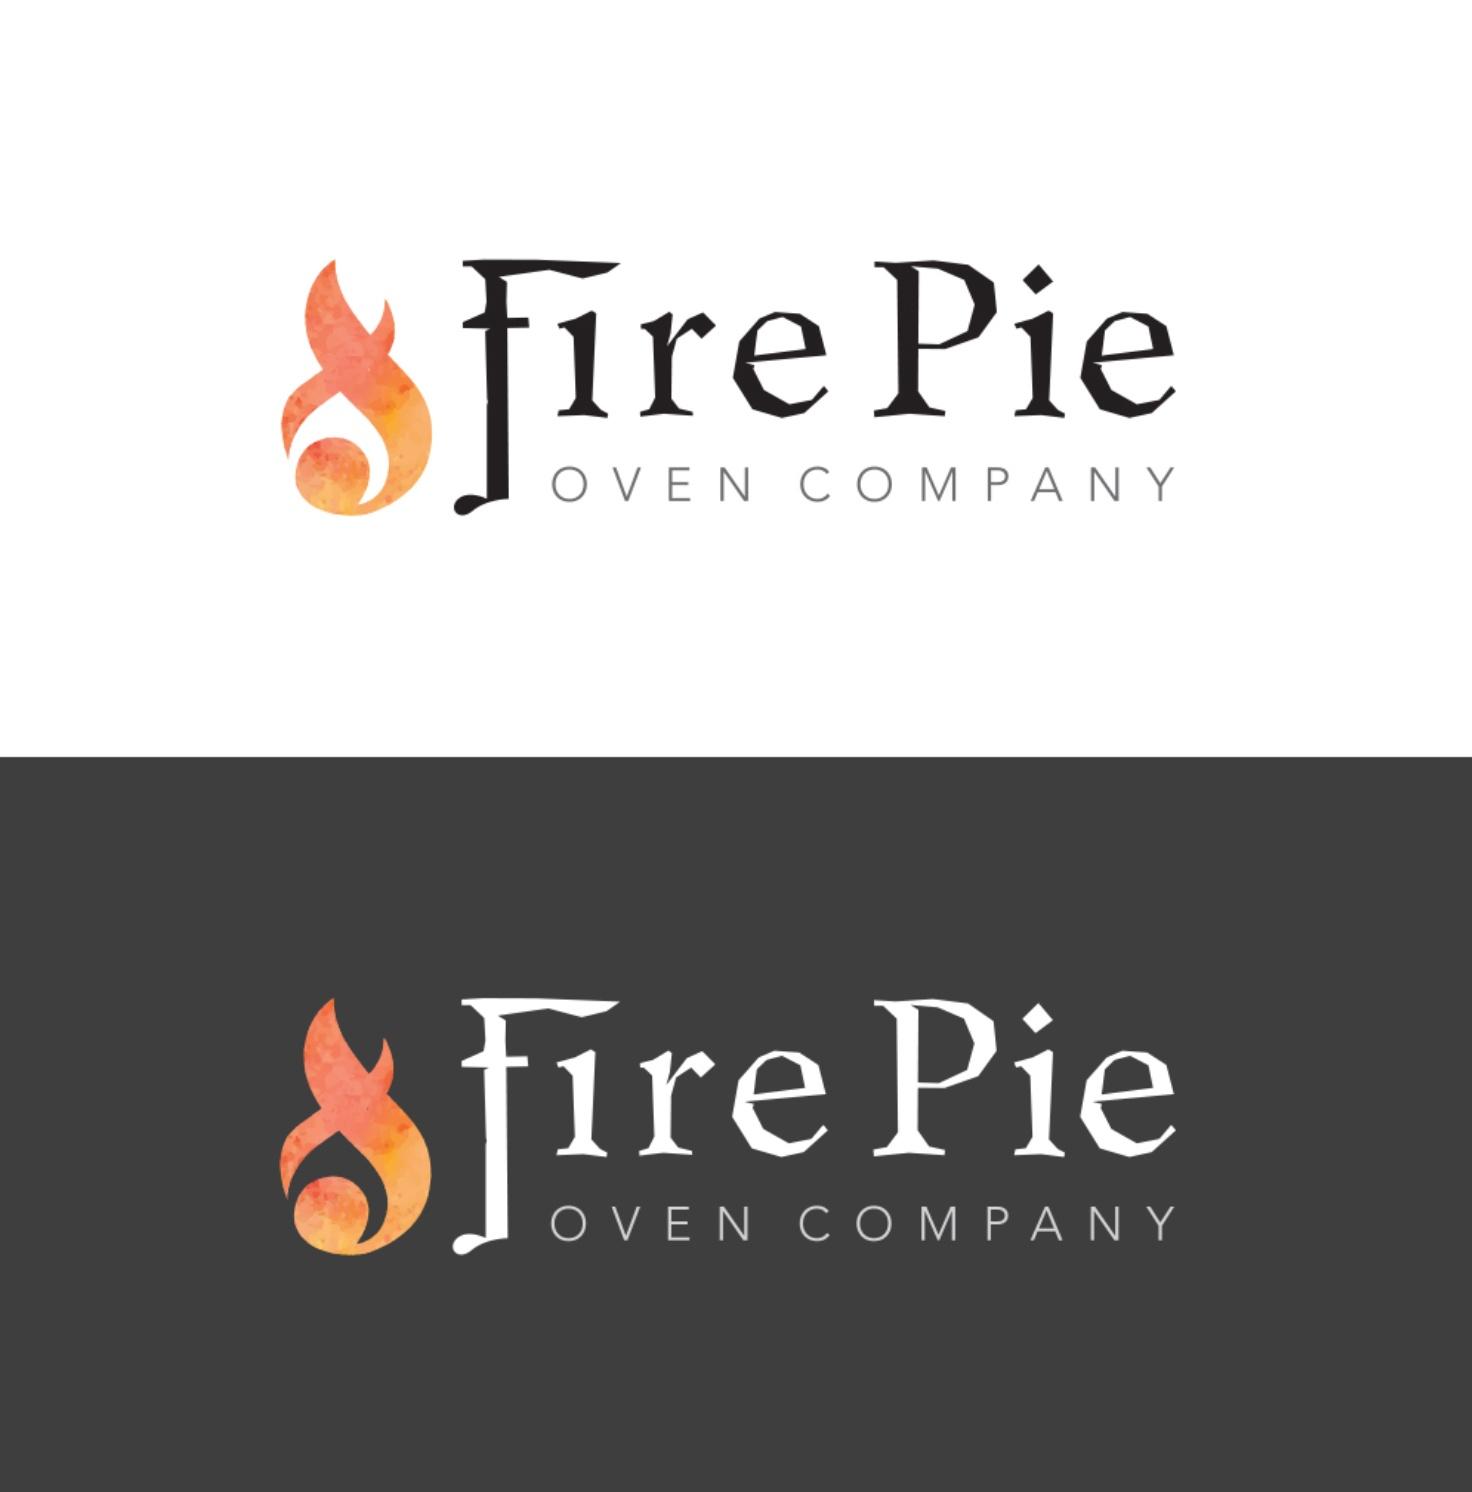 Fire Pie Oven Company Logo